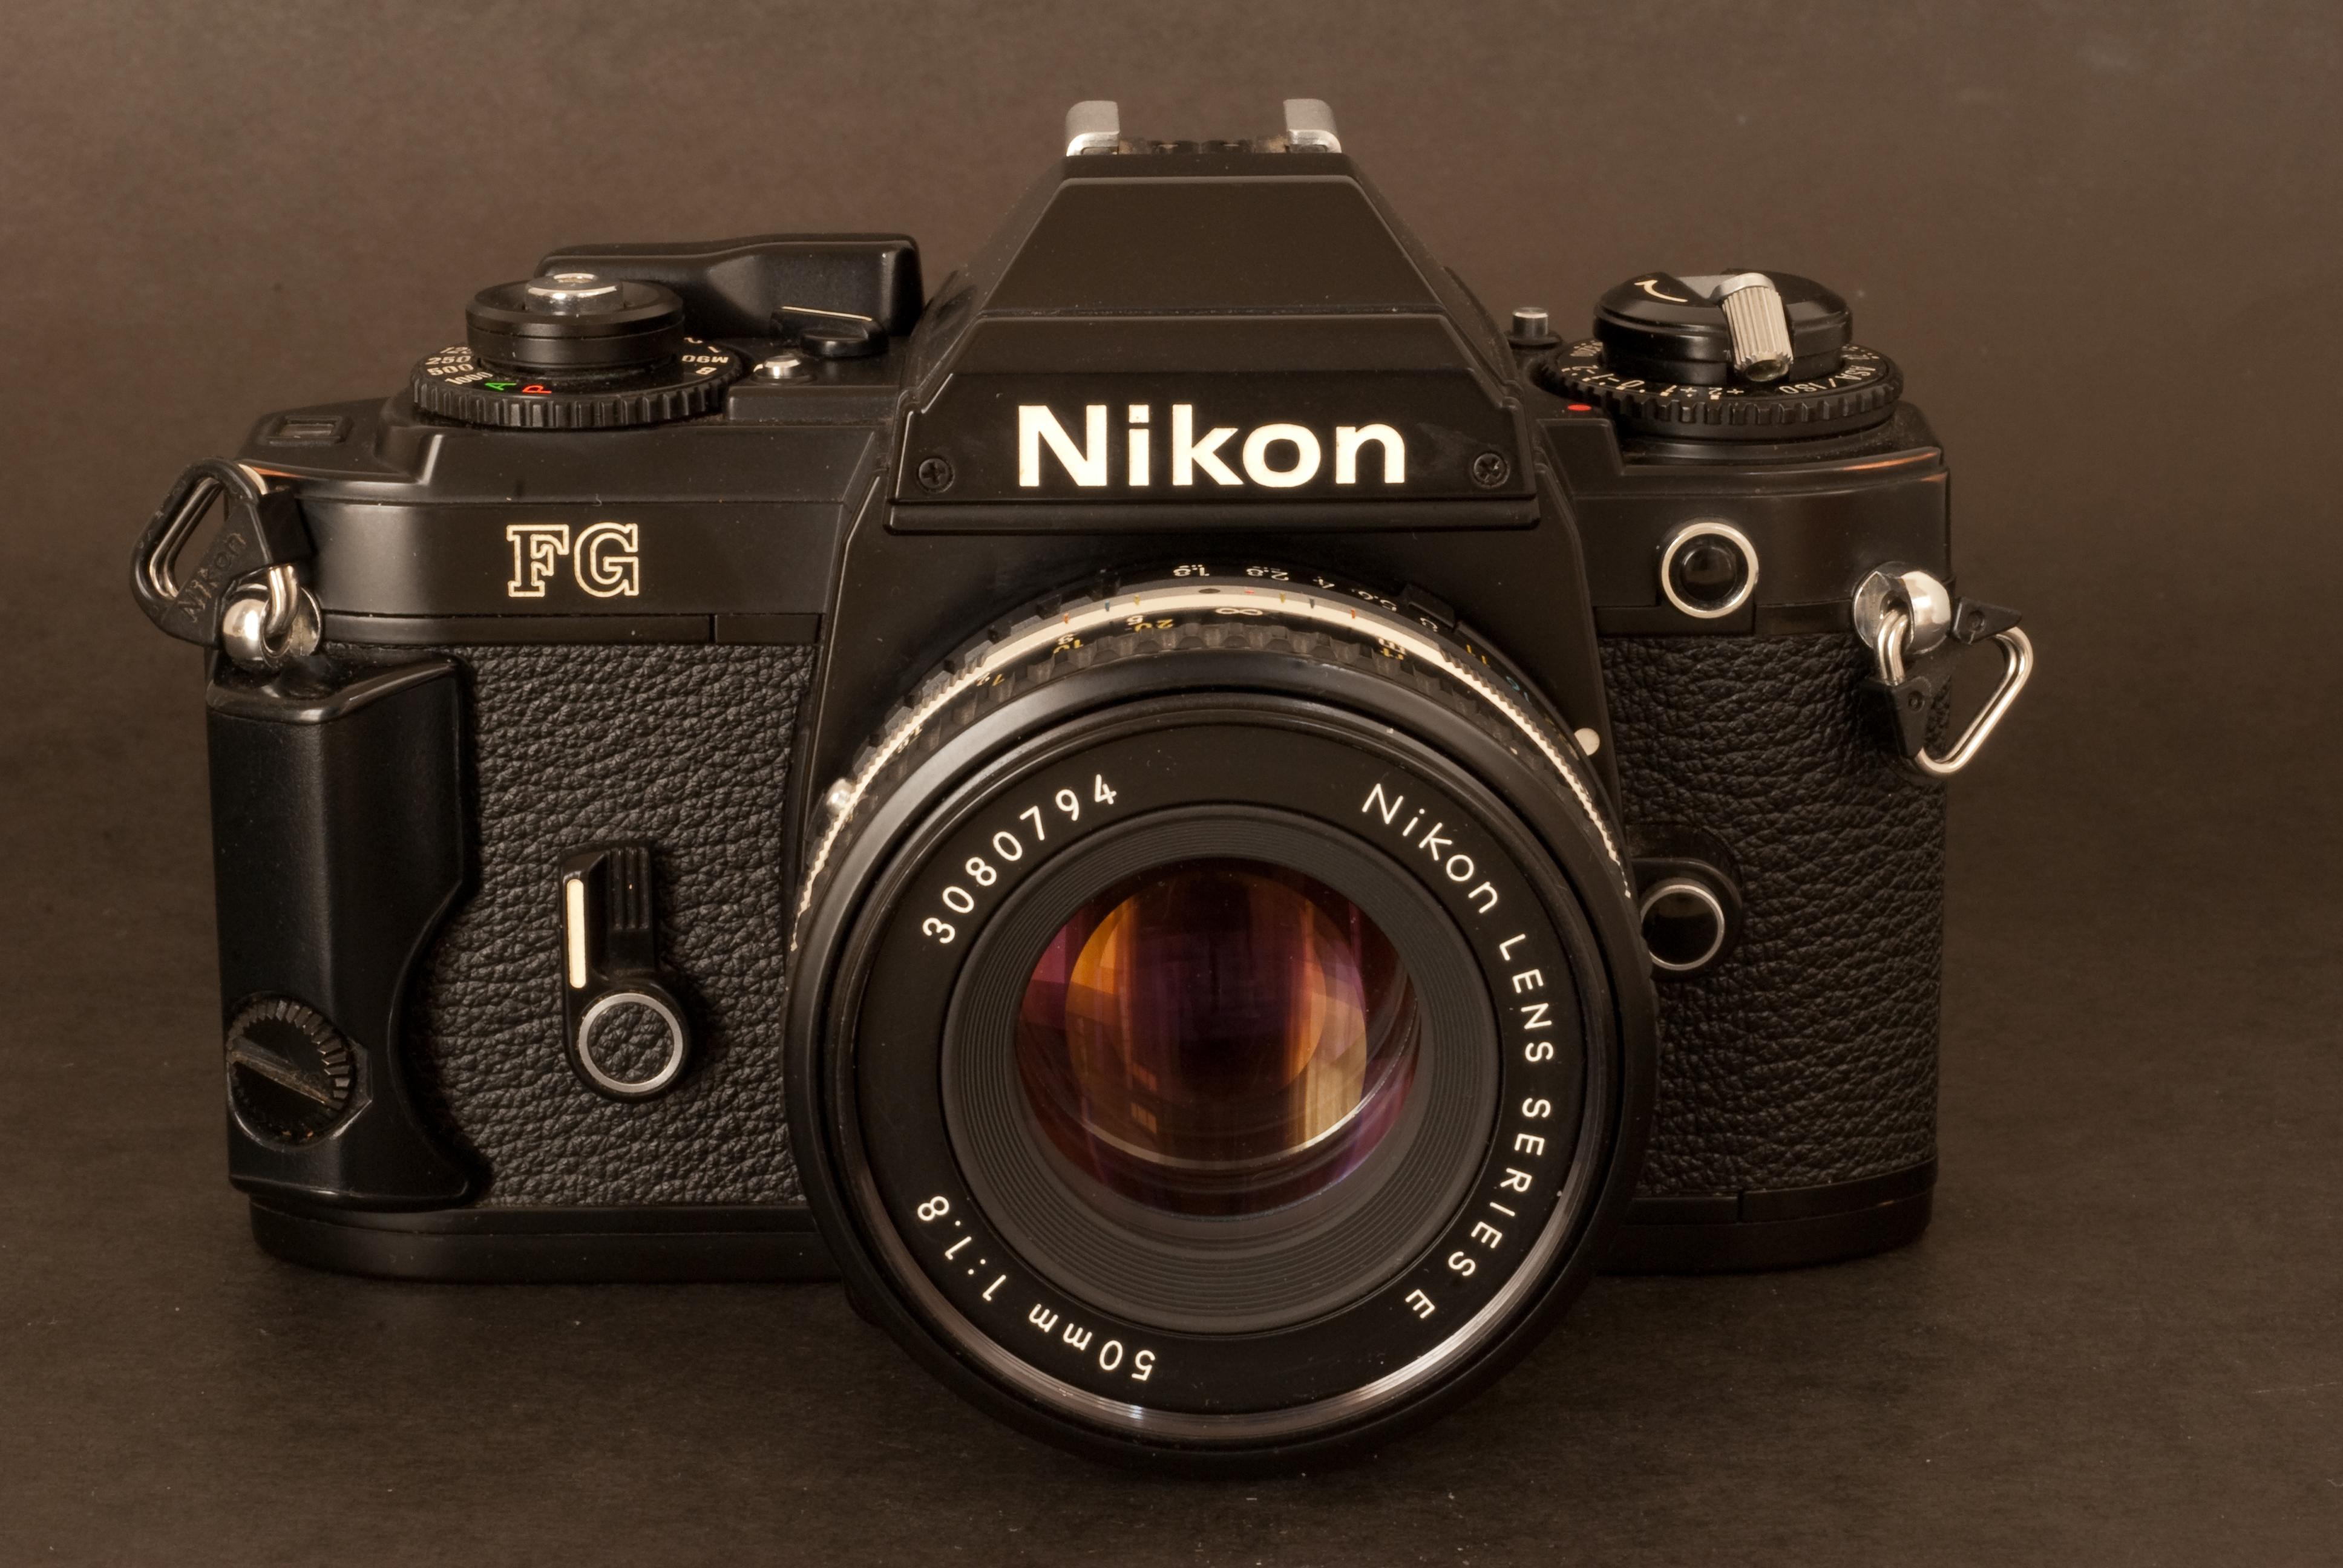 nikons s most advanced manual focus u201cultra compact u201d slr the nikon rh cameragx com Nikon FG Body Nikon FG Camera Manual